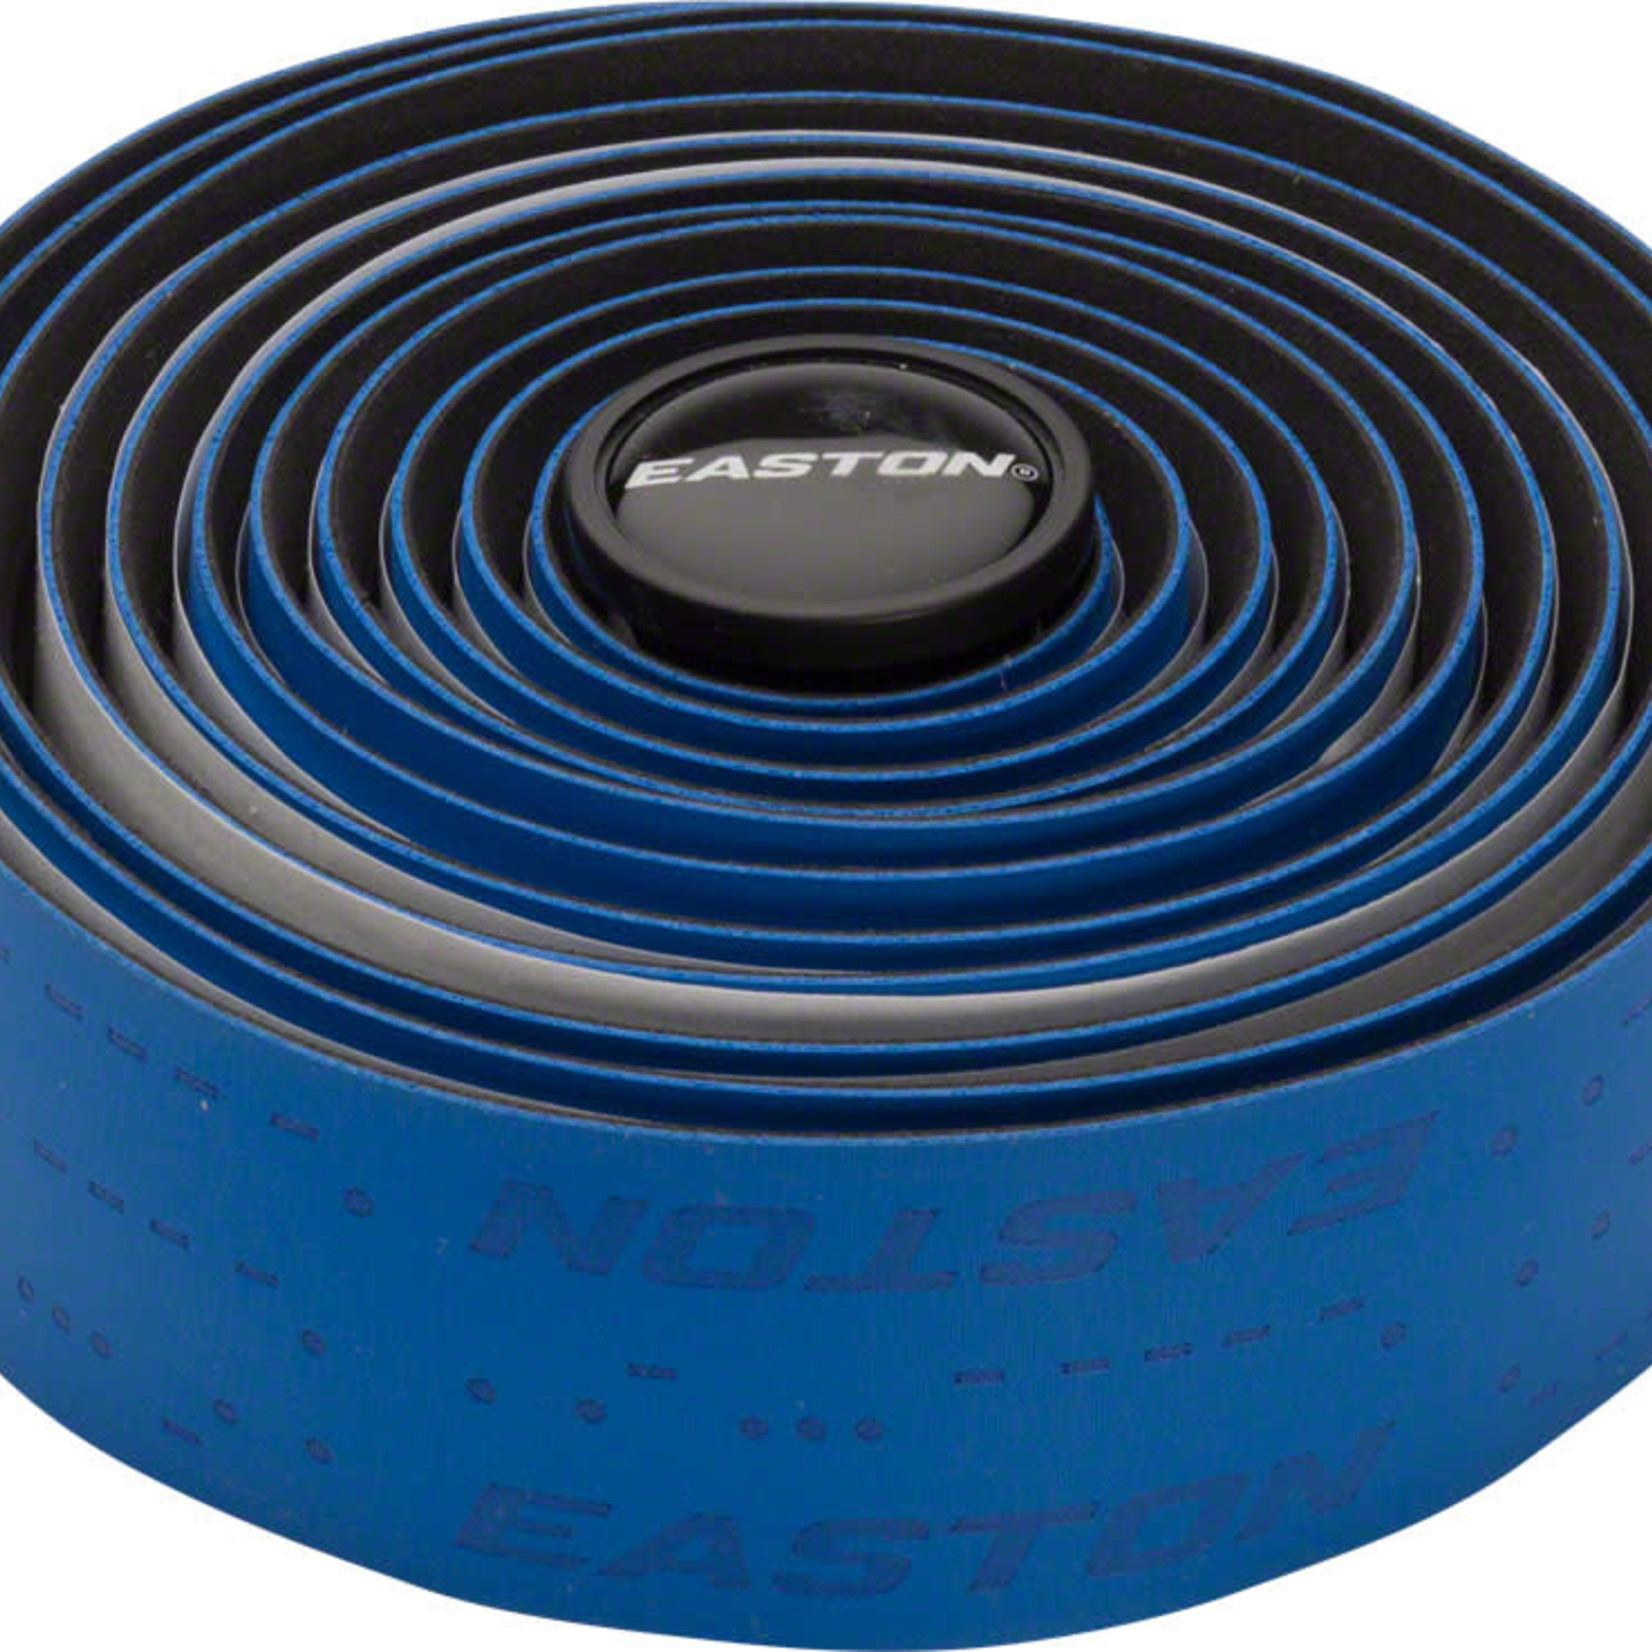 Easton Easton Microfiber Handlebar Tape Blue